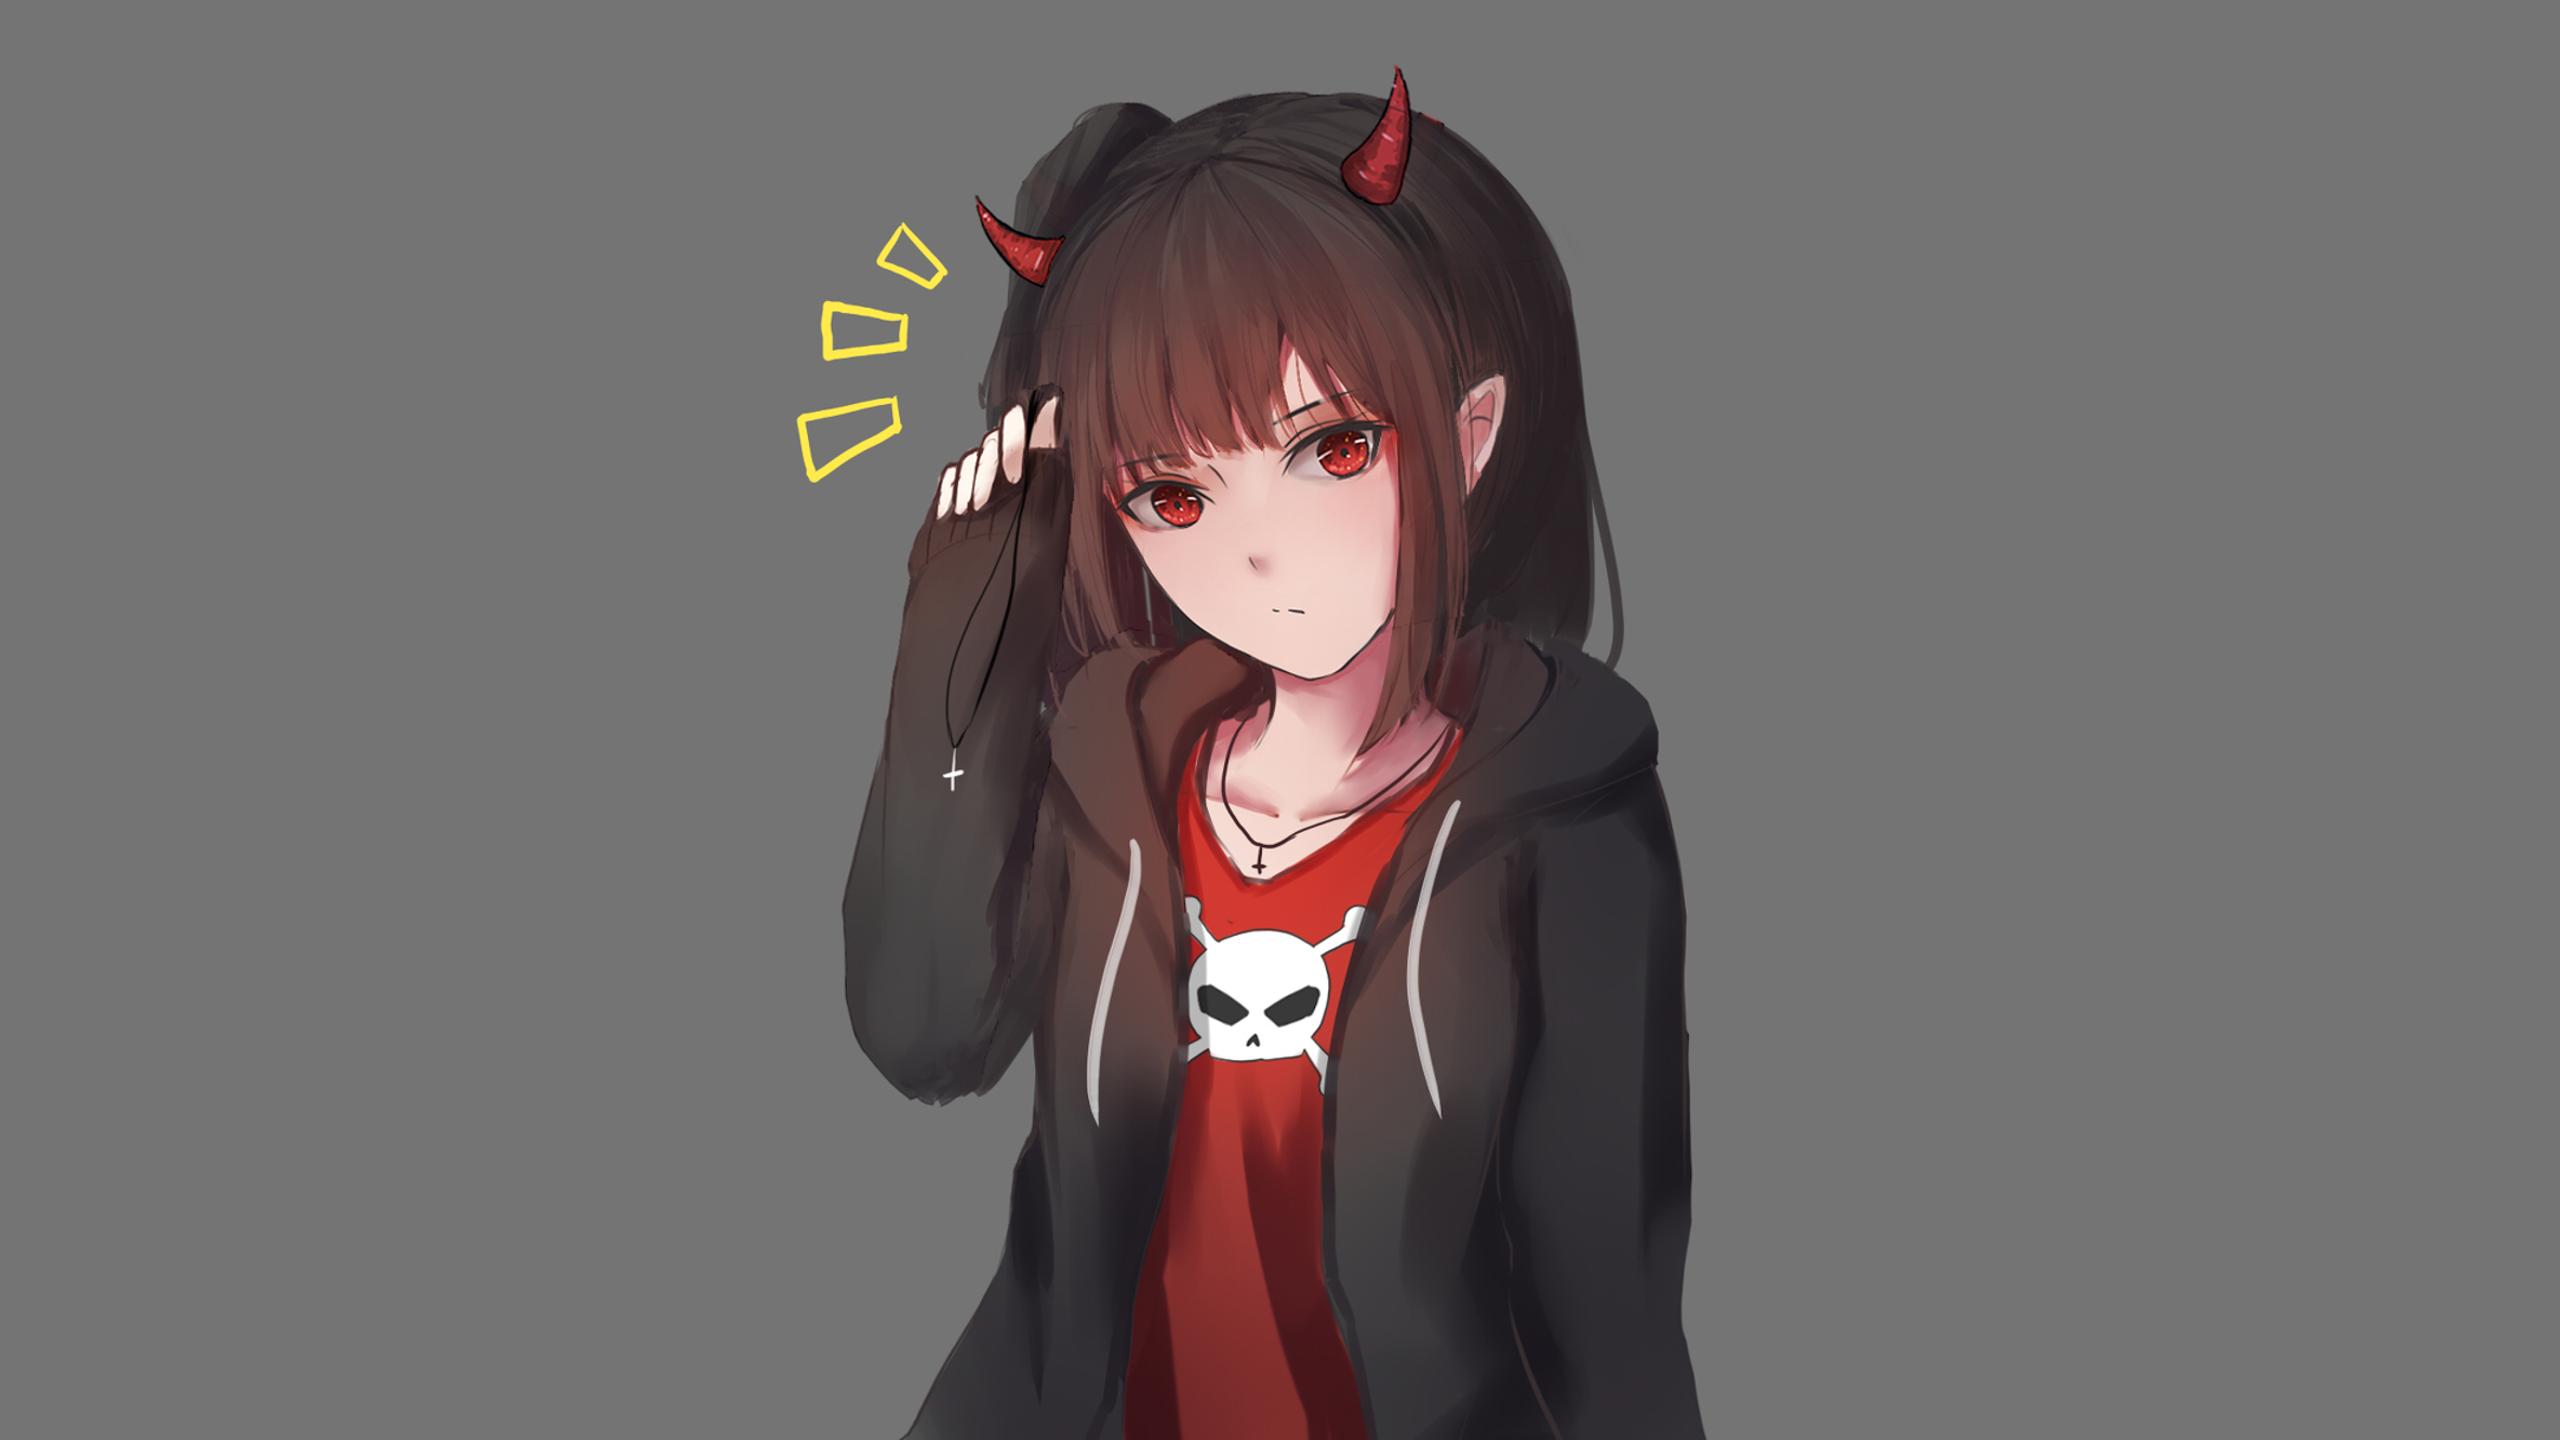 Anime Girl Hd Wallpaper Background Image 2560x1440 Id 936642